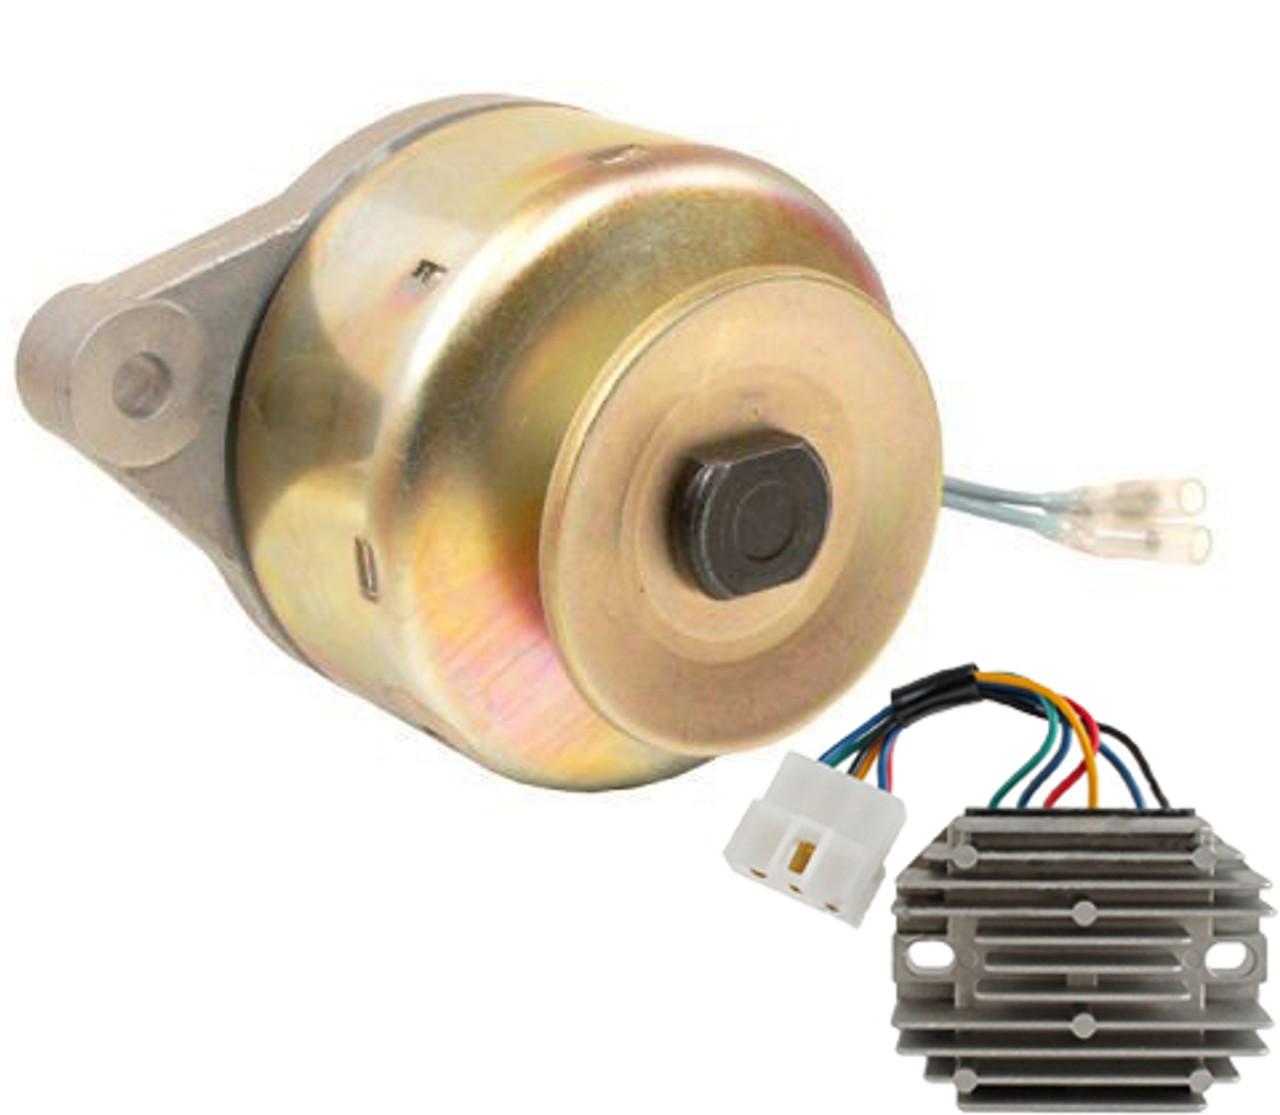 Kubota G1900 Wiring Harness - custom project wiring diagram on